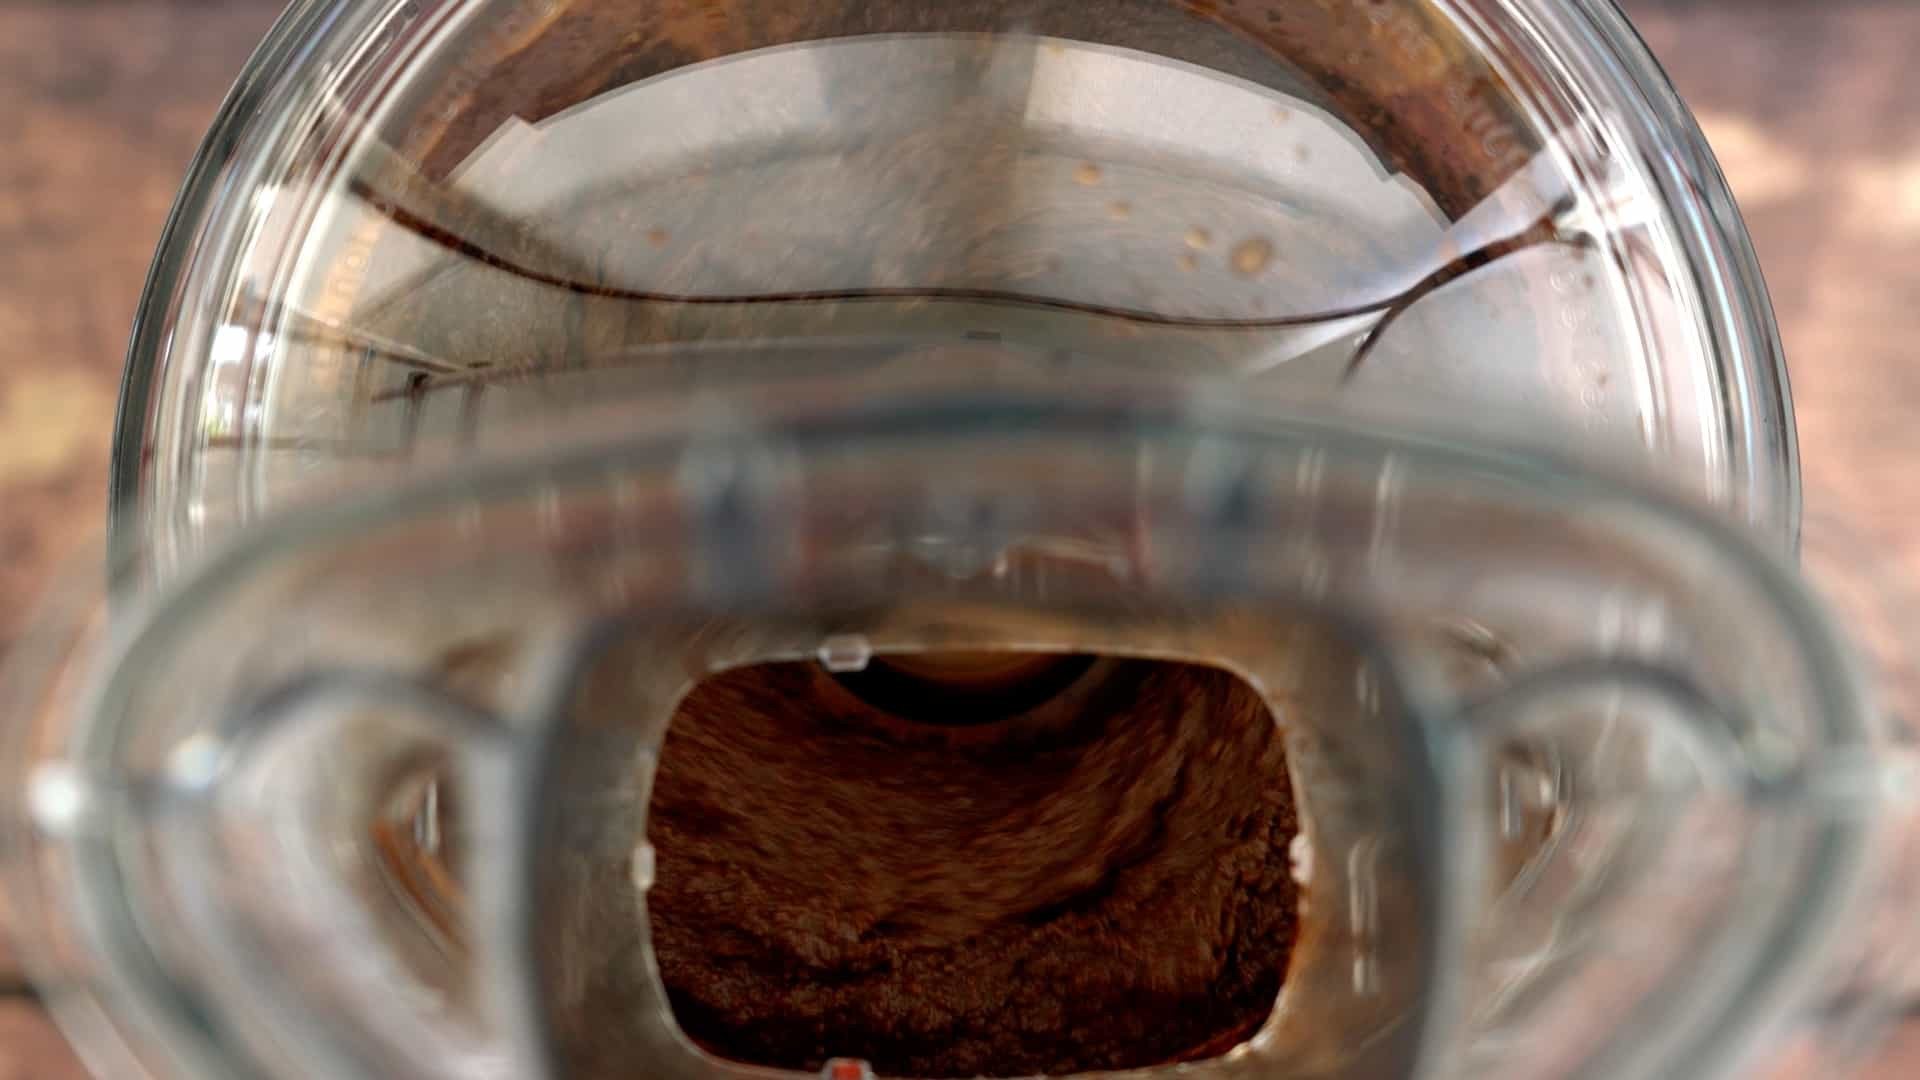 A food processor blending a smooth chocolate dip.